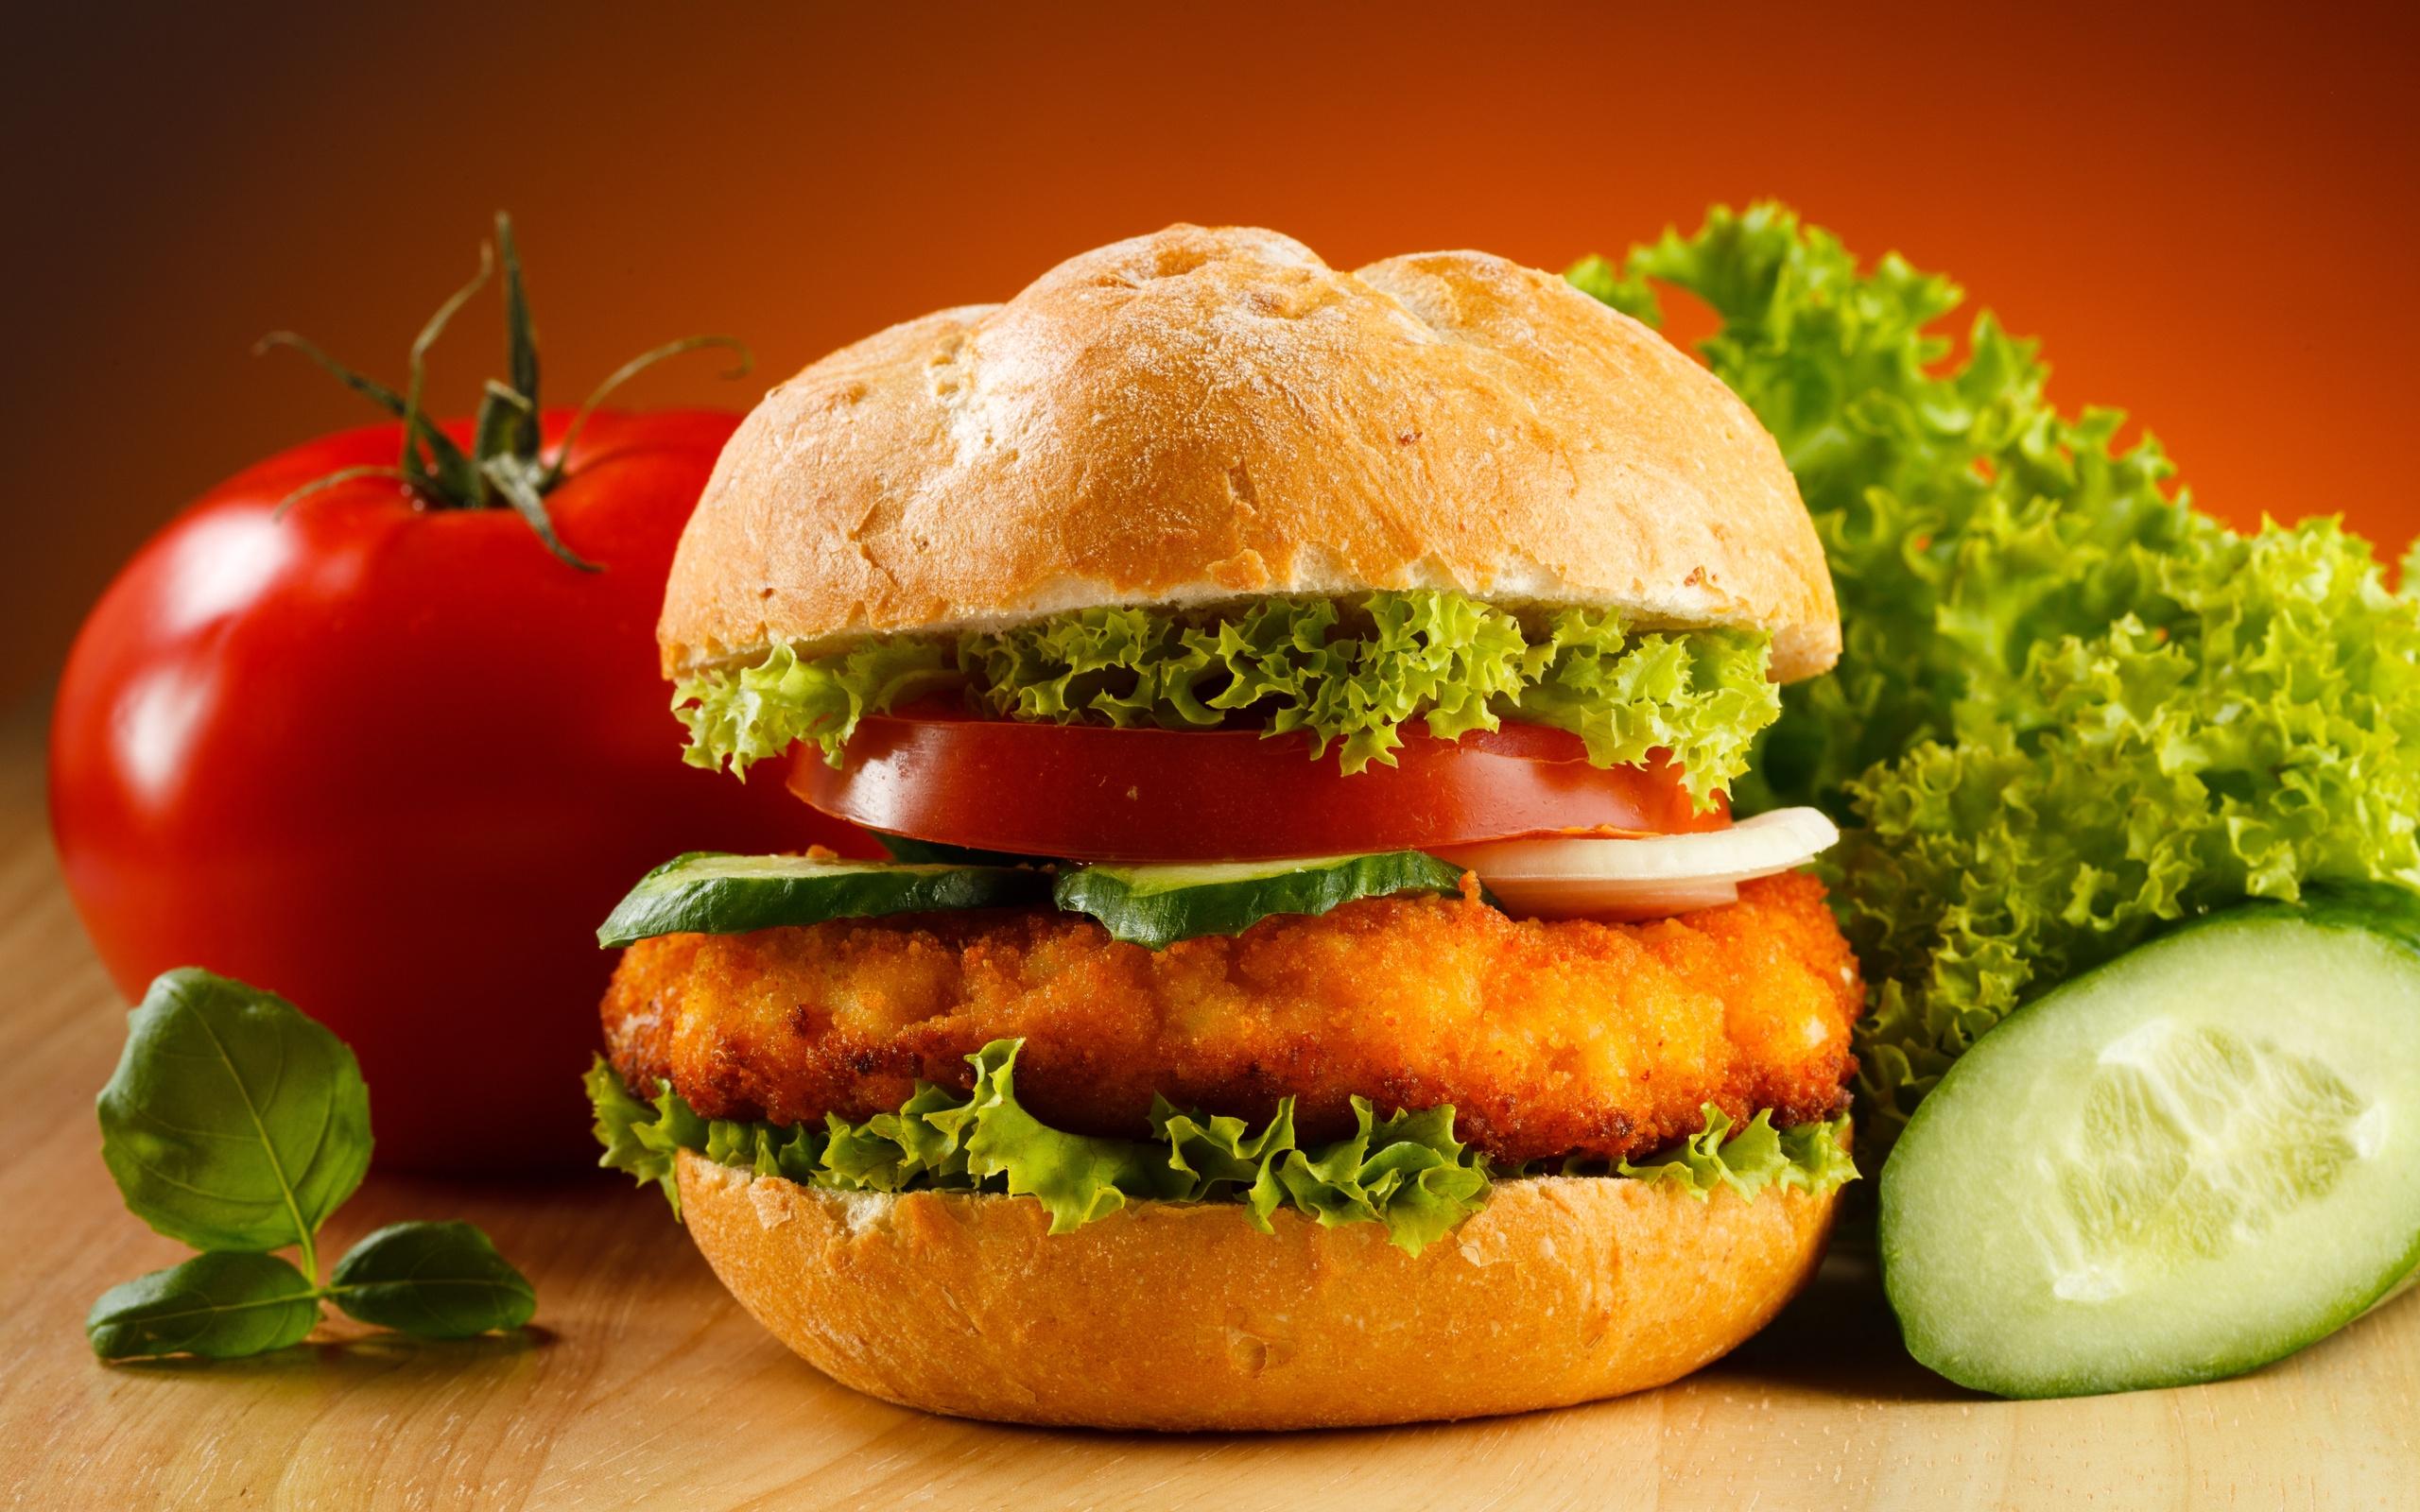 Good Wallpaper High Quality Burger - food-meat-vegetables-sandwich-burger-fast-food-hamburger-cuisine-dish-produce-vegetable-slider-veggie-burger-bread-roll-609912  Picture_552947.jpg